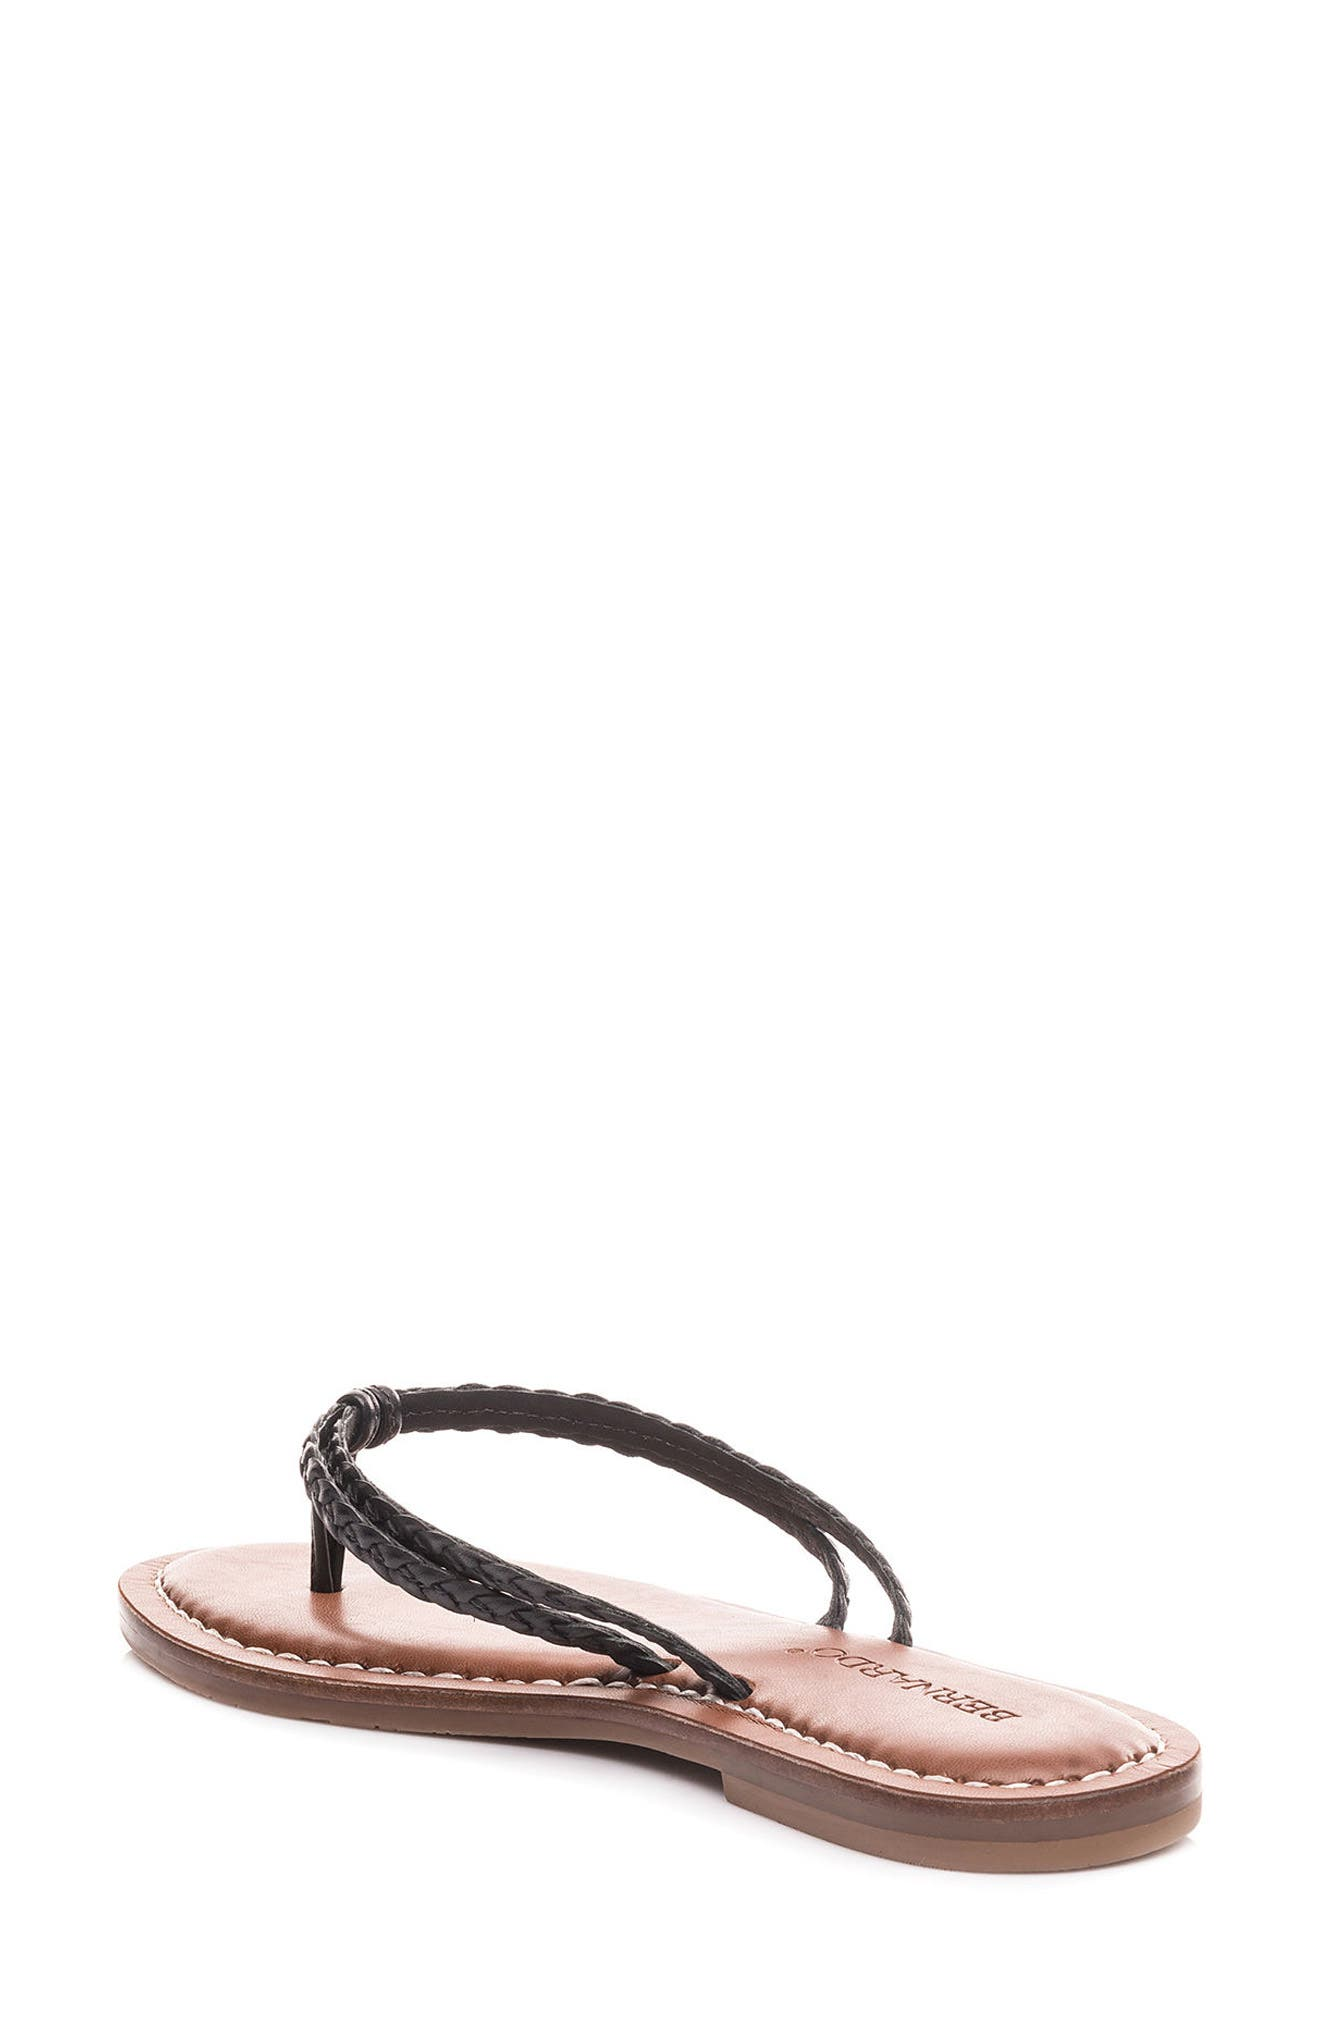 Bernardo Greta Braided Strap Sandal,                             Alternate thumbnail 2, color,                             Black Leather